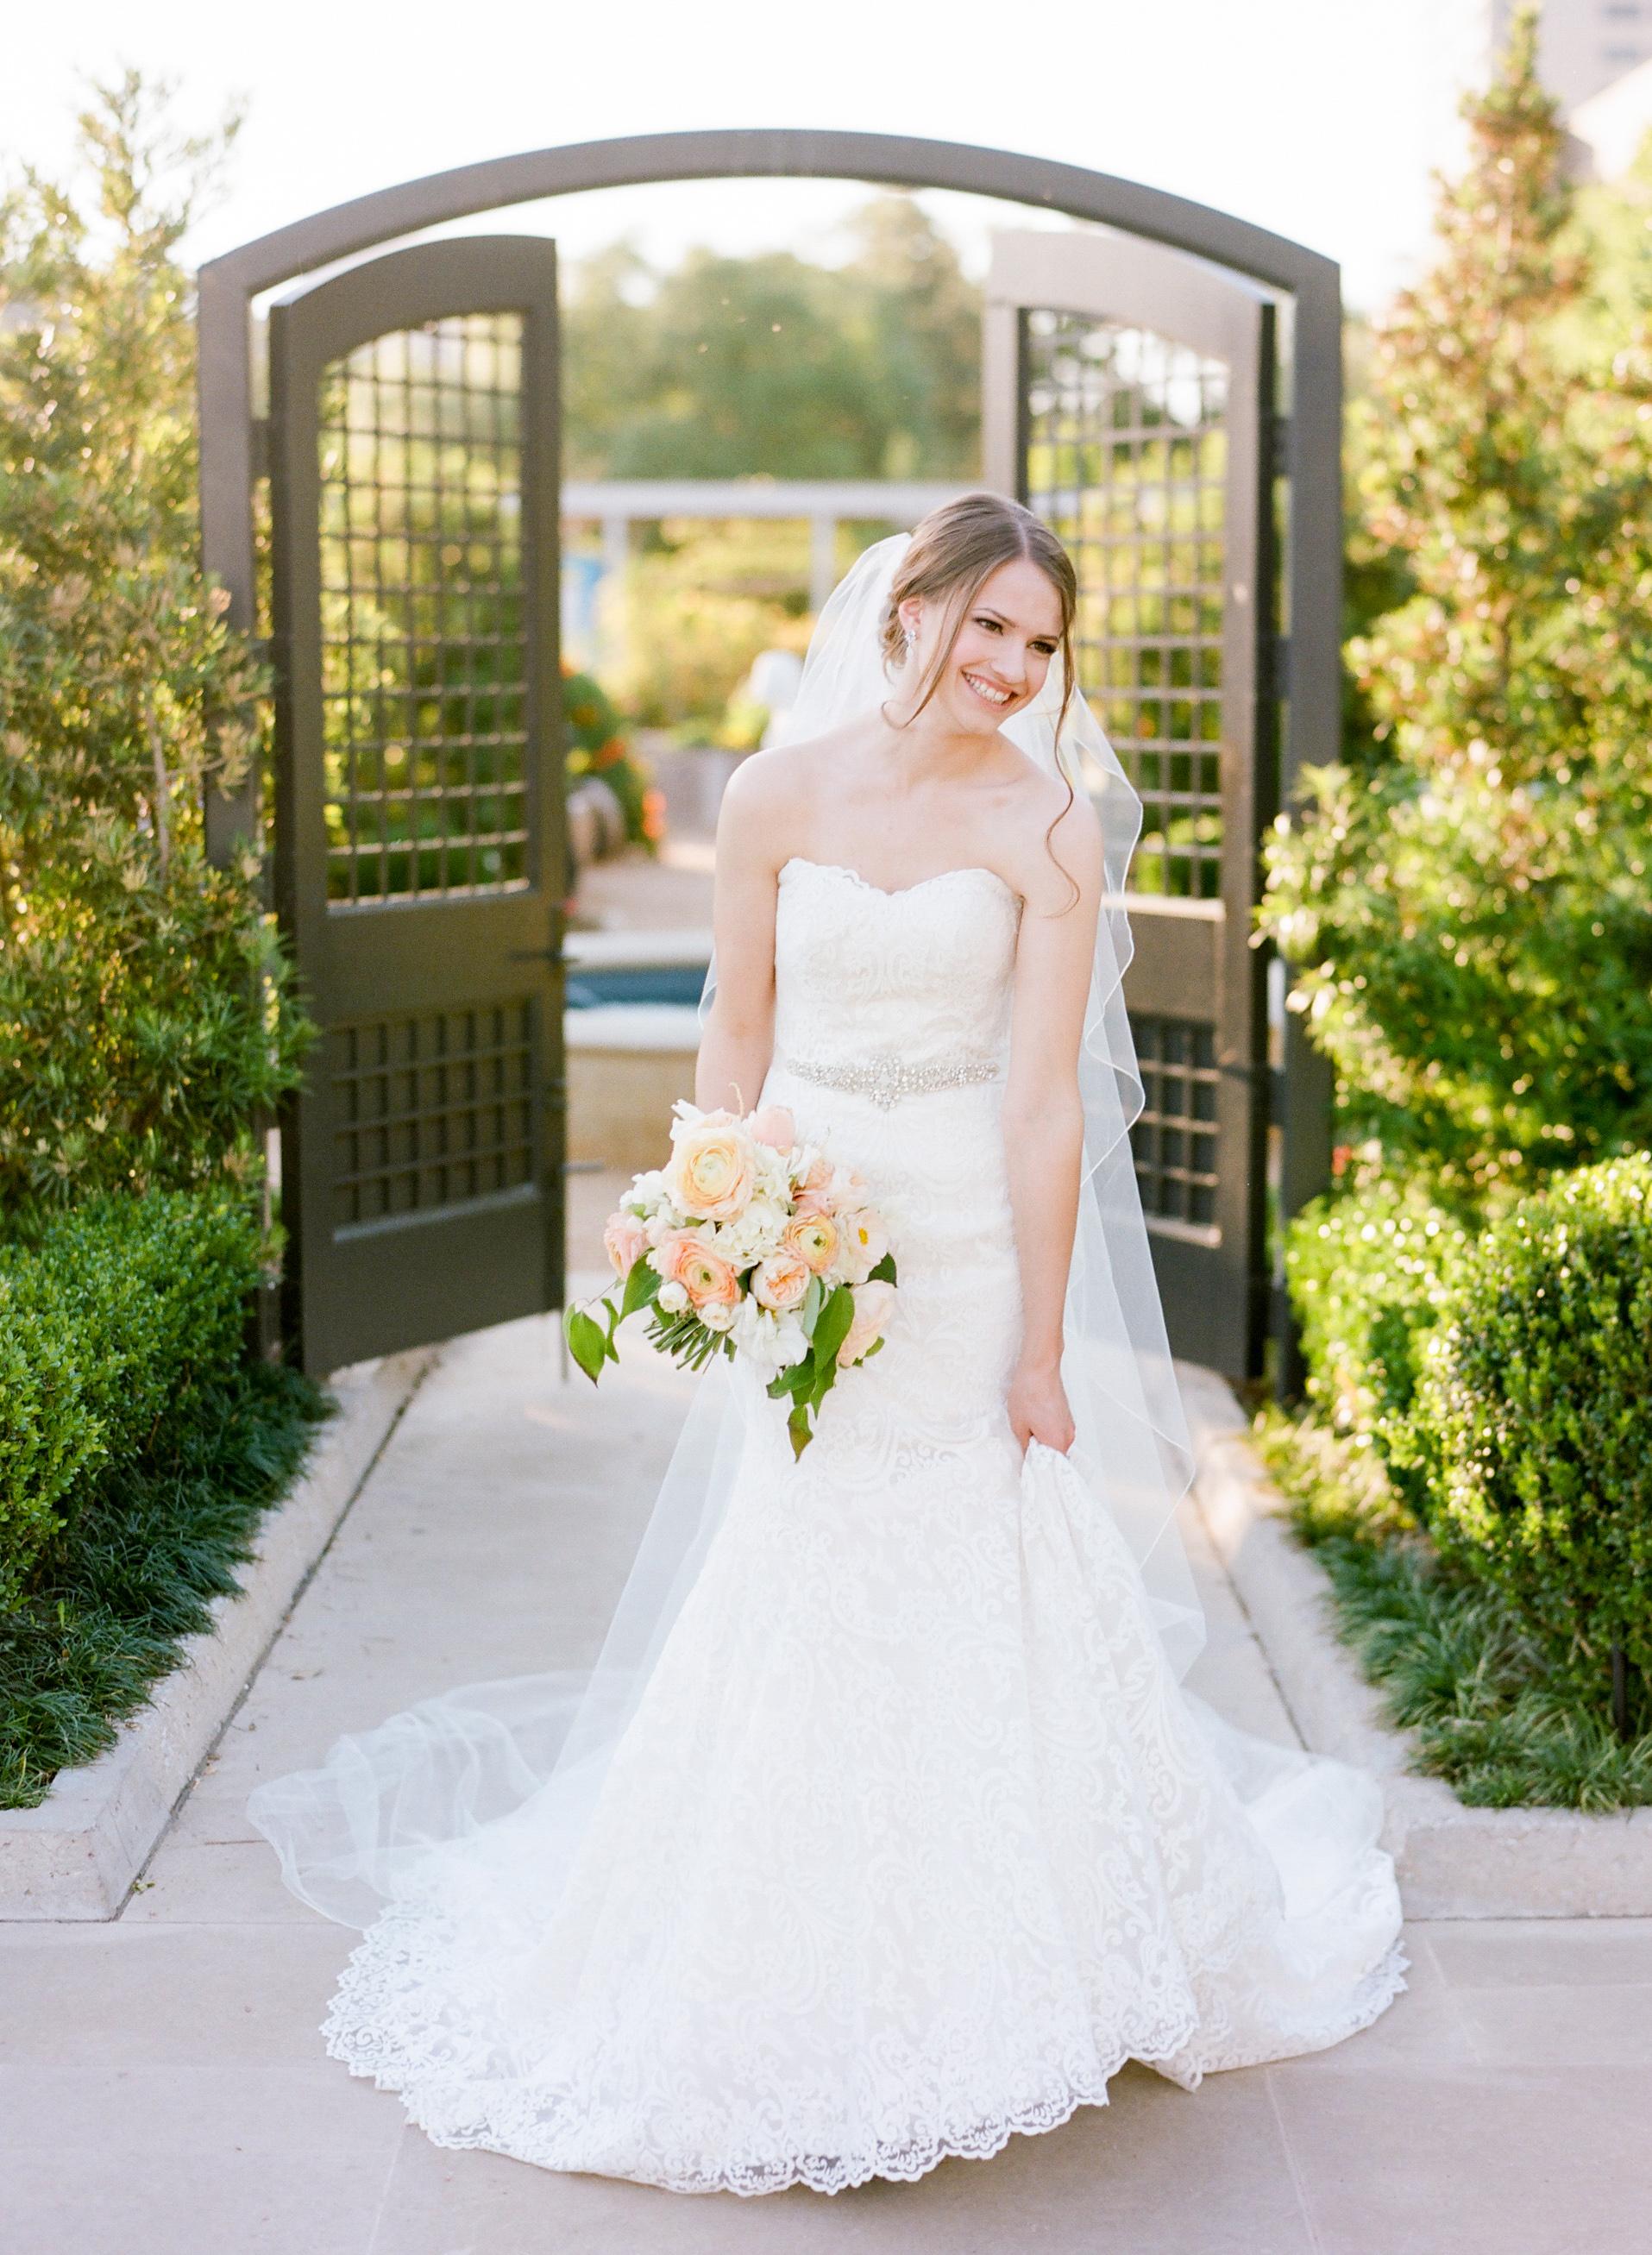 Houston-Wedding-Photographer-Film-Fine-Art-Bridals-Dana+Fernandez-Photography-6.jpg